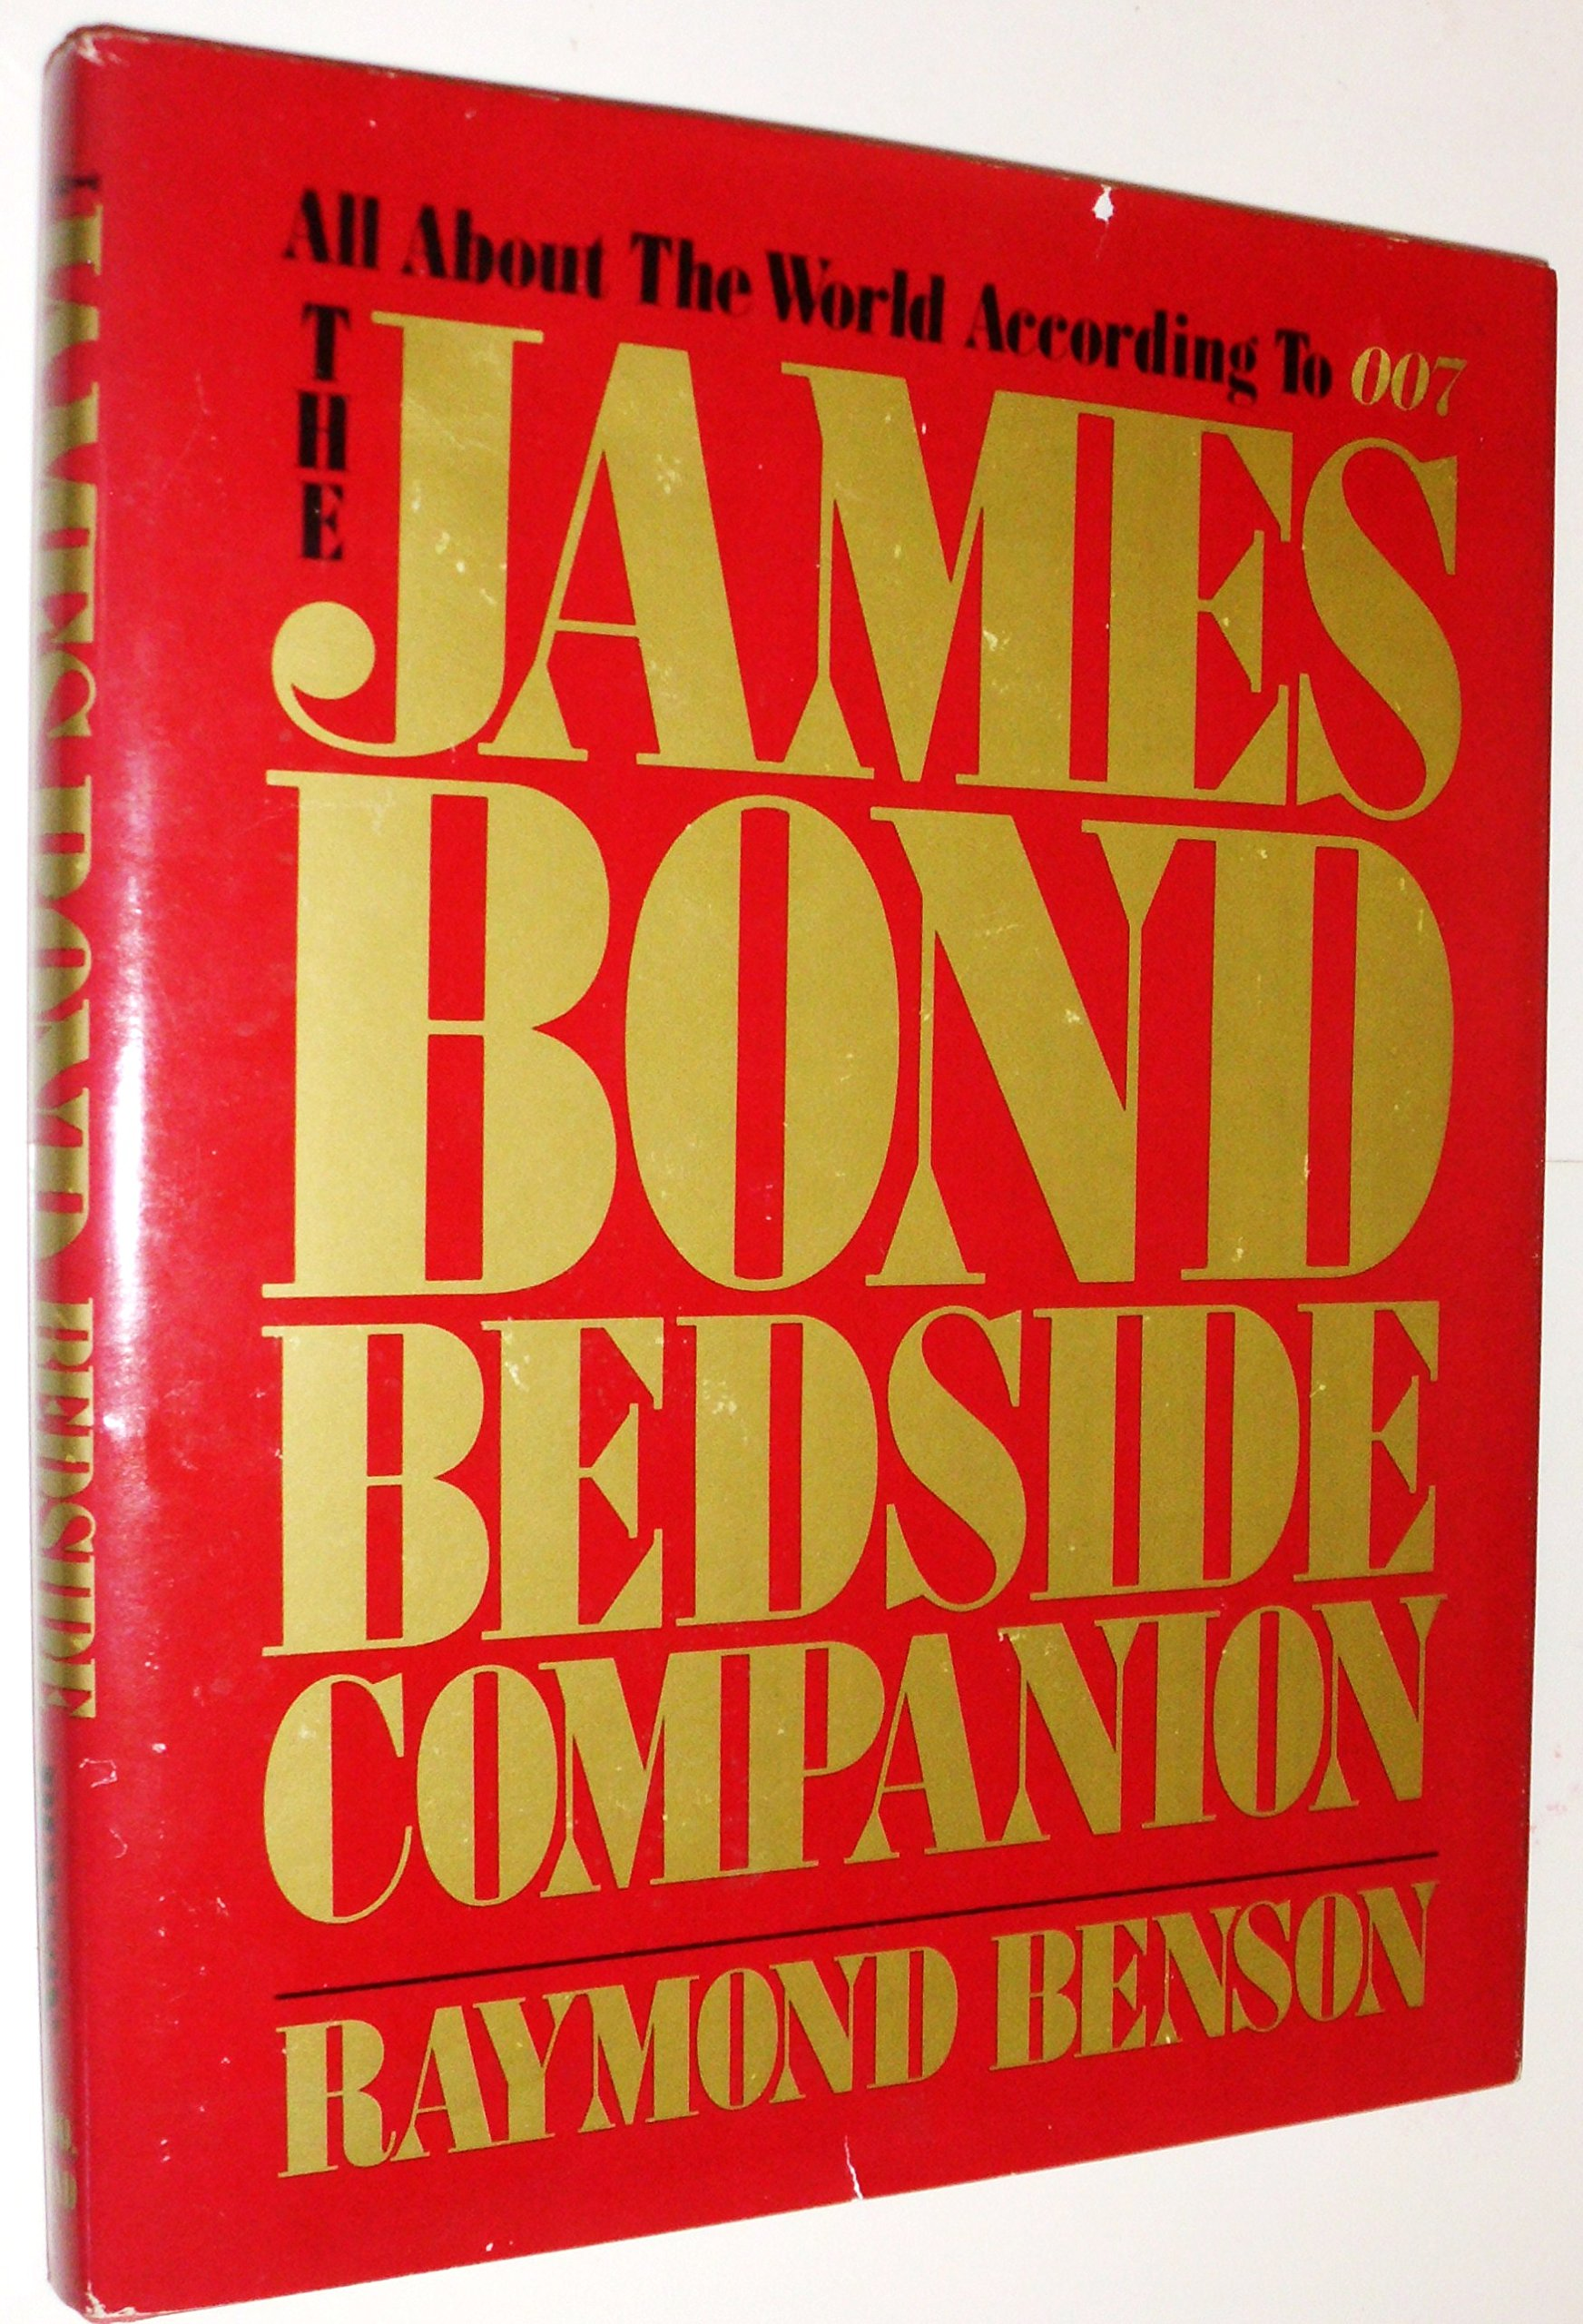 The James Bond Bedside Companion: Raymond Benson: 9780396083832:  Amazon.com: Books